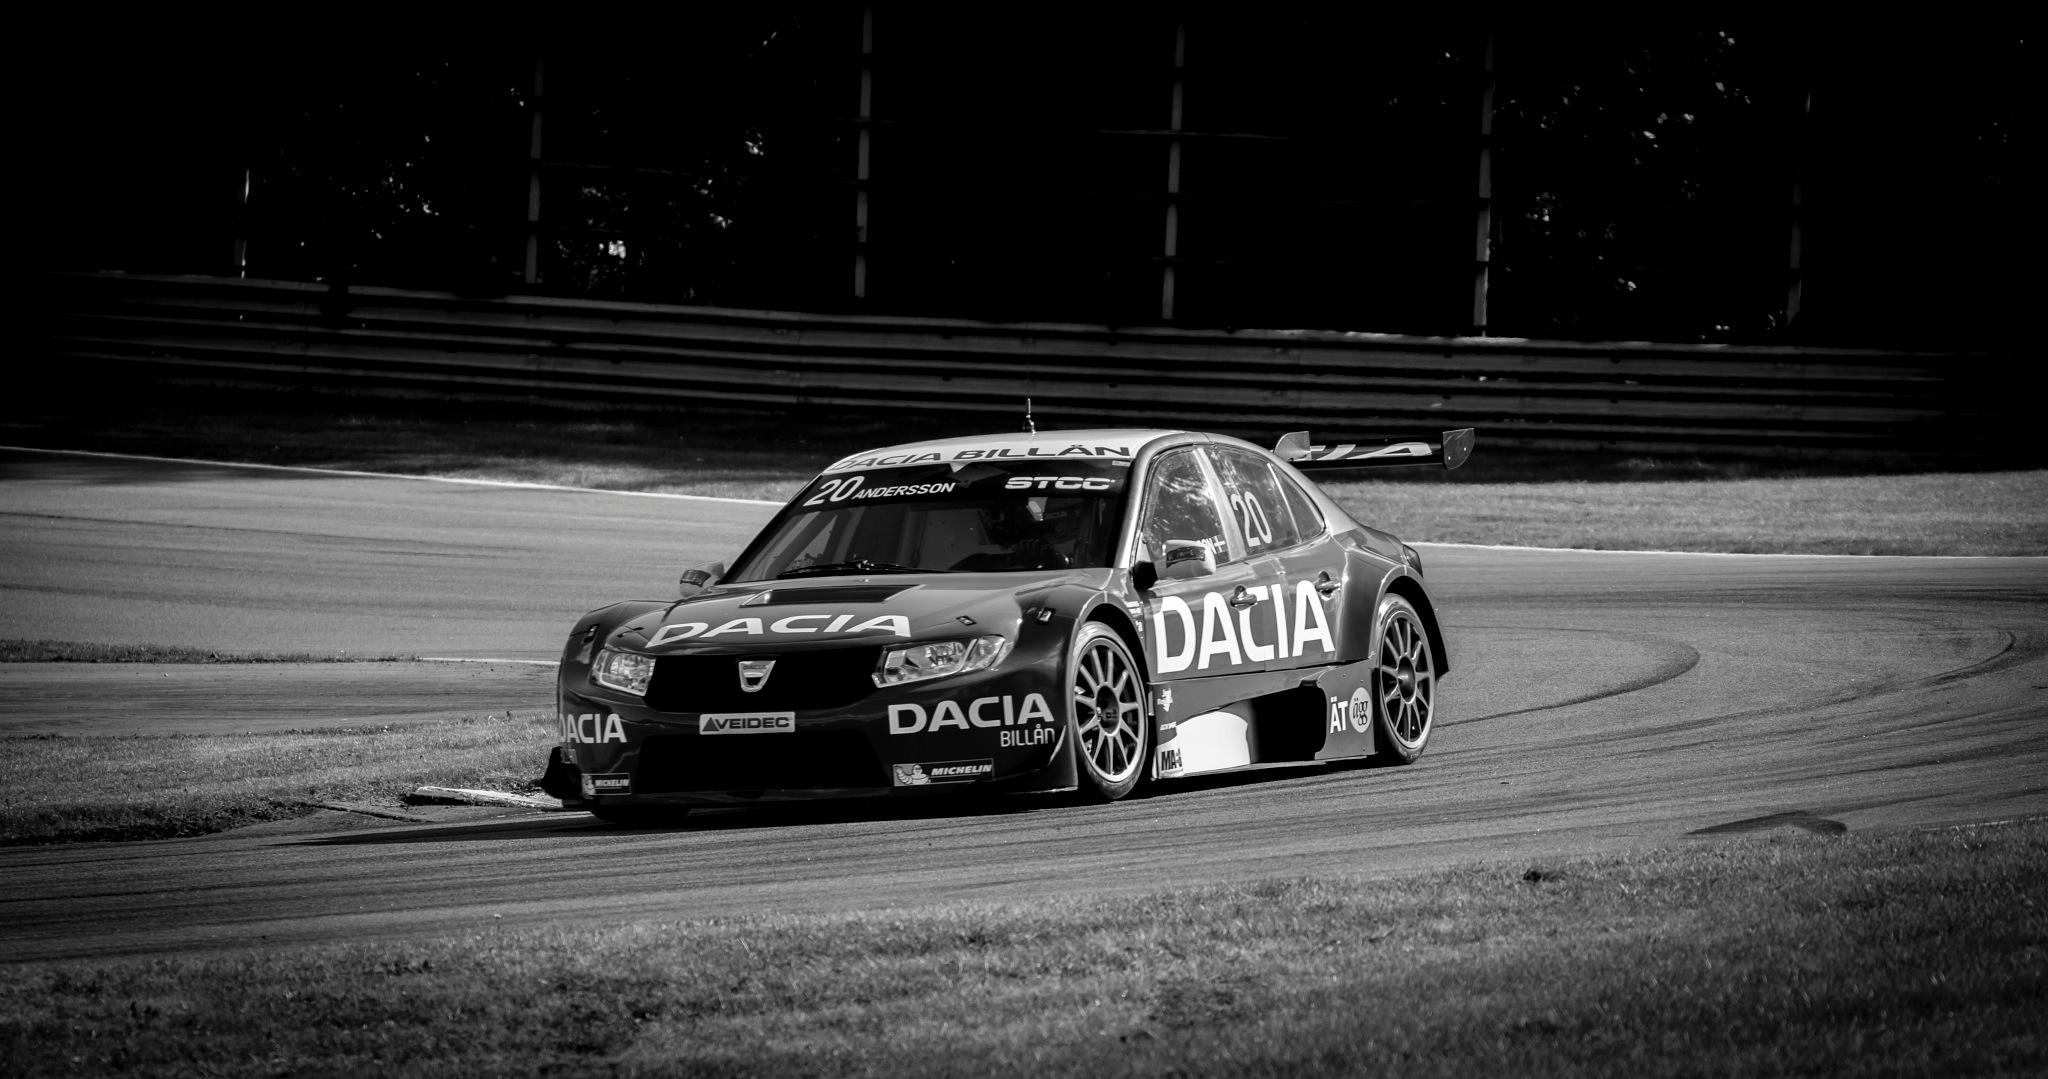 Stcc by Daniel Paulsson